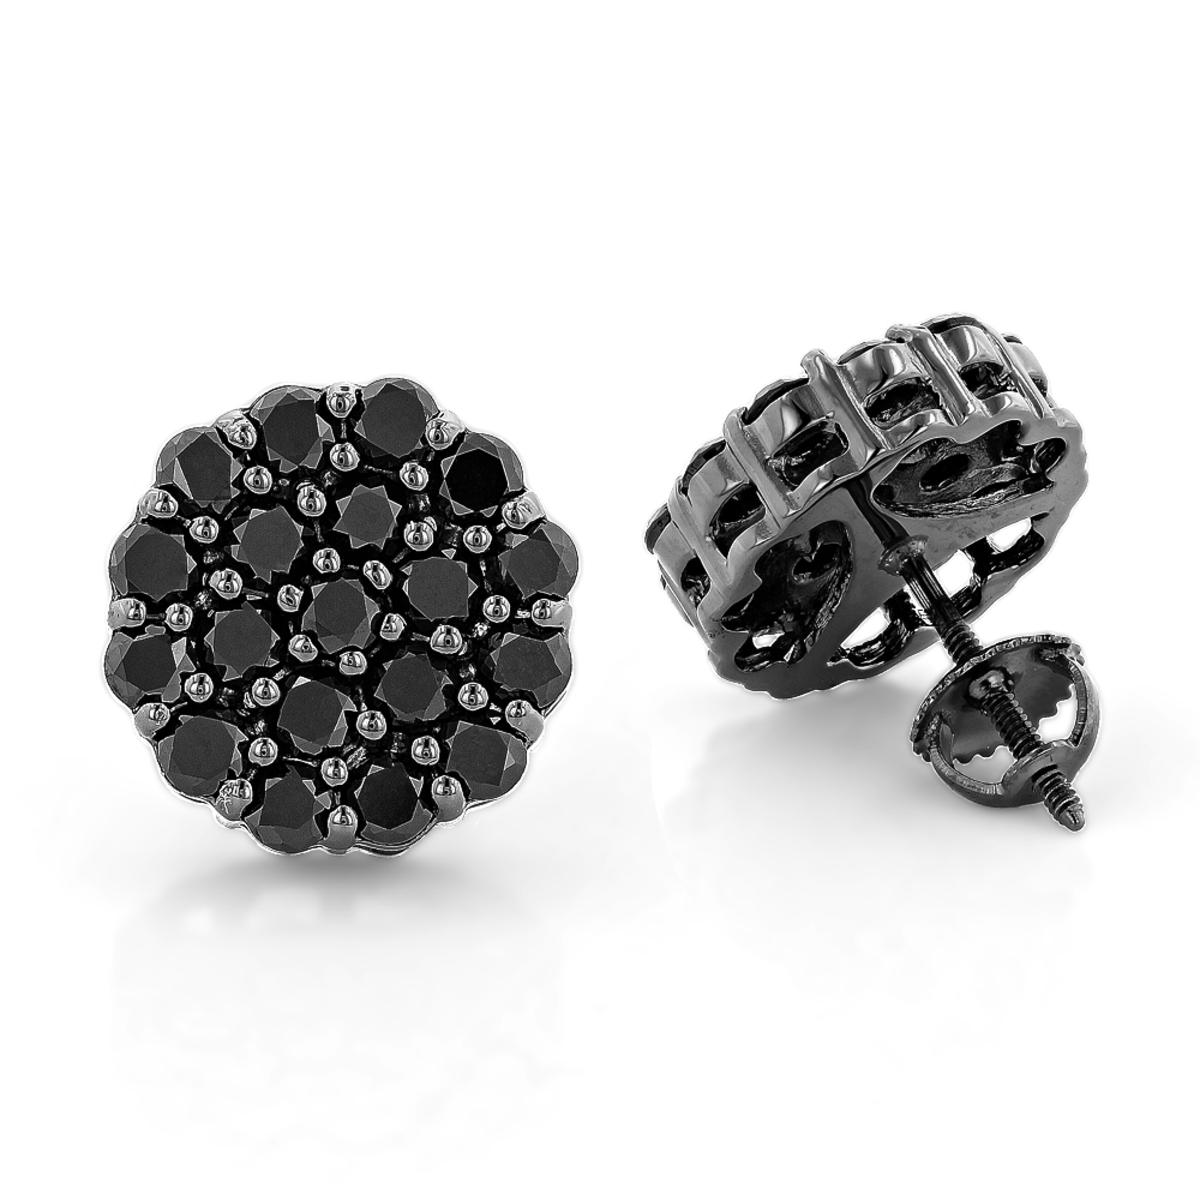 Large Black Diamond Cluster Earrings 3.5 ct 10K Gold Studs